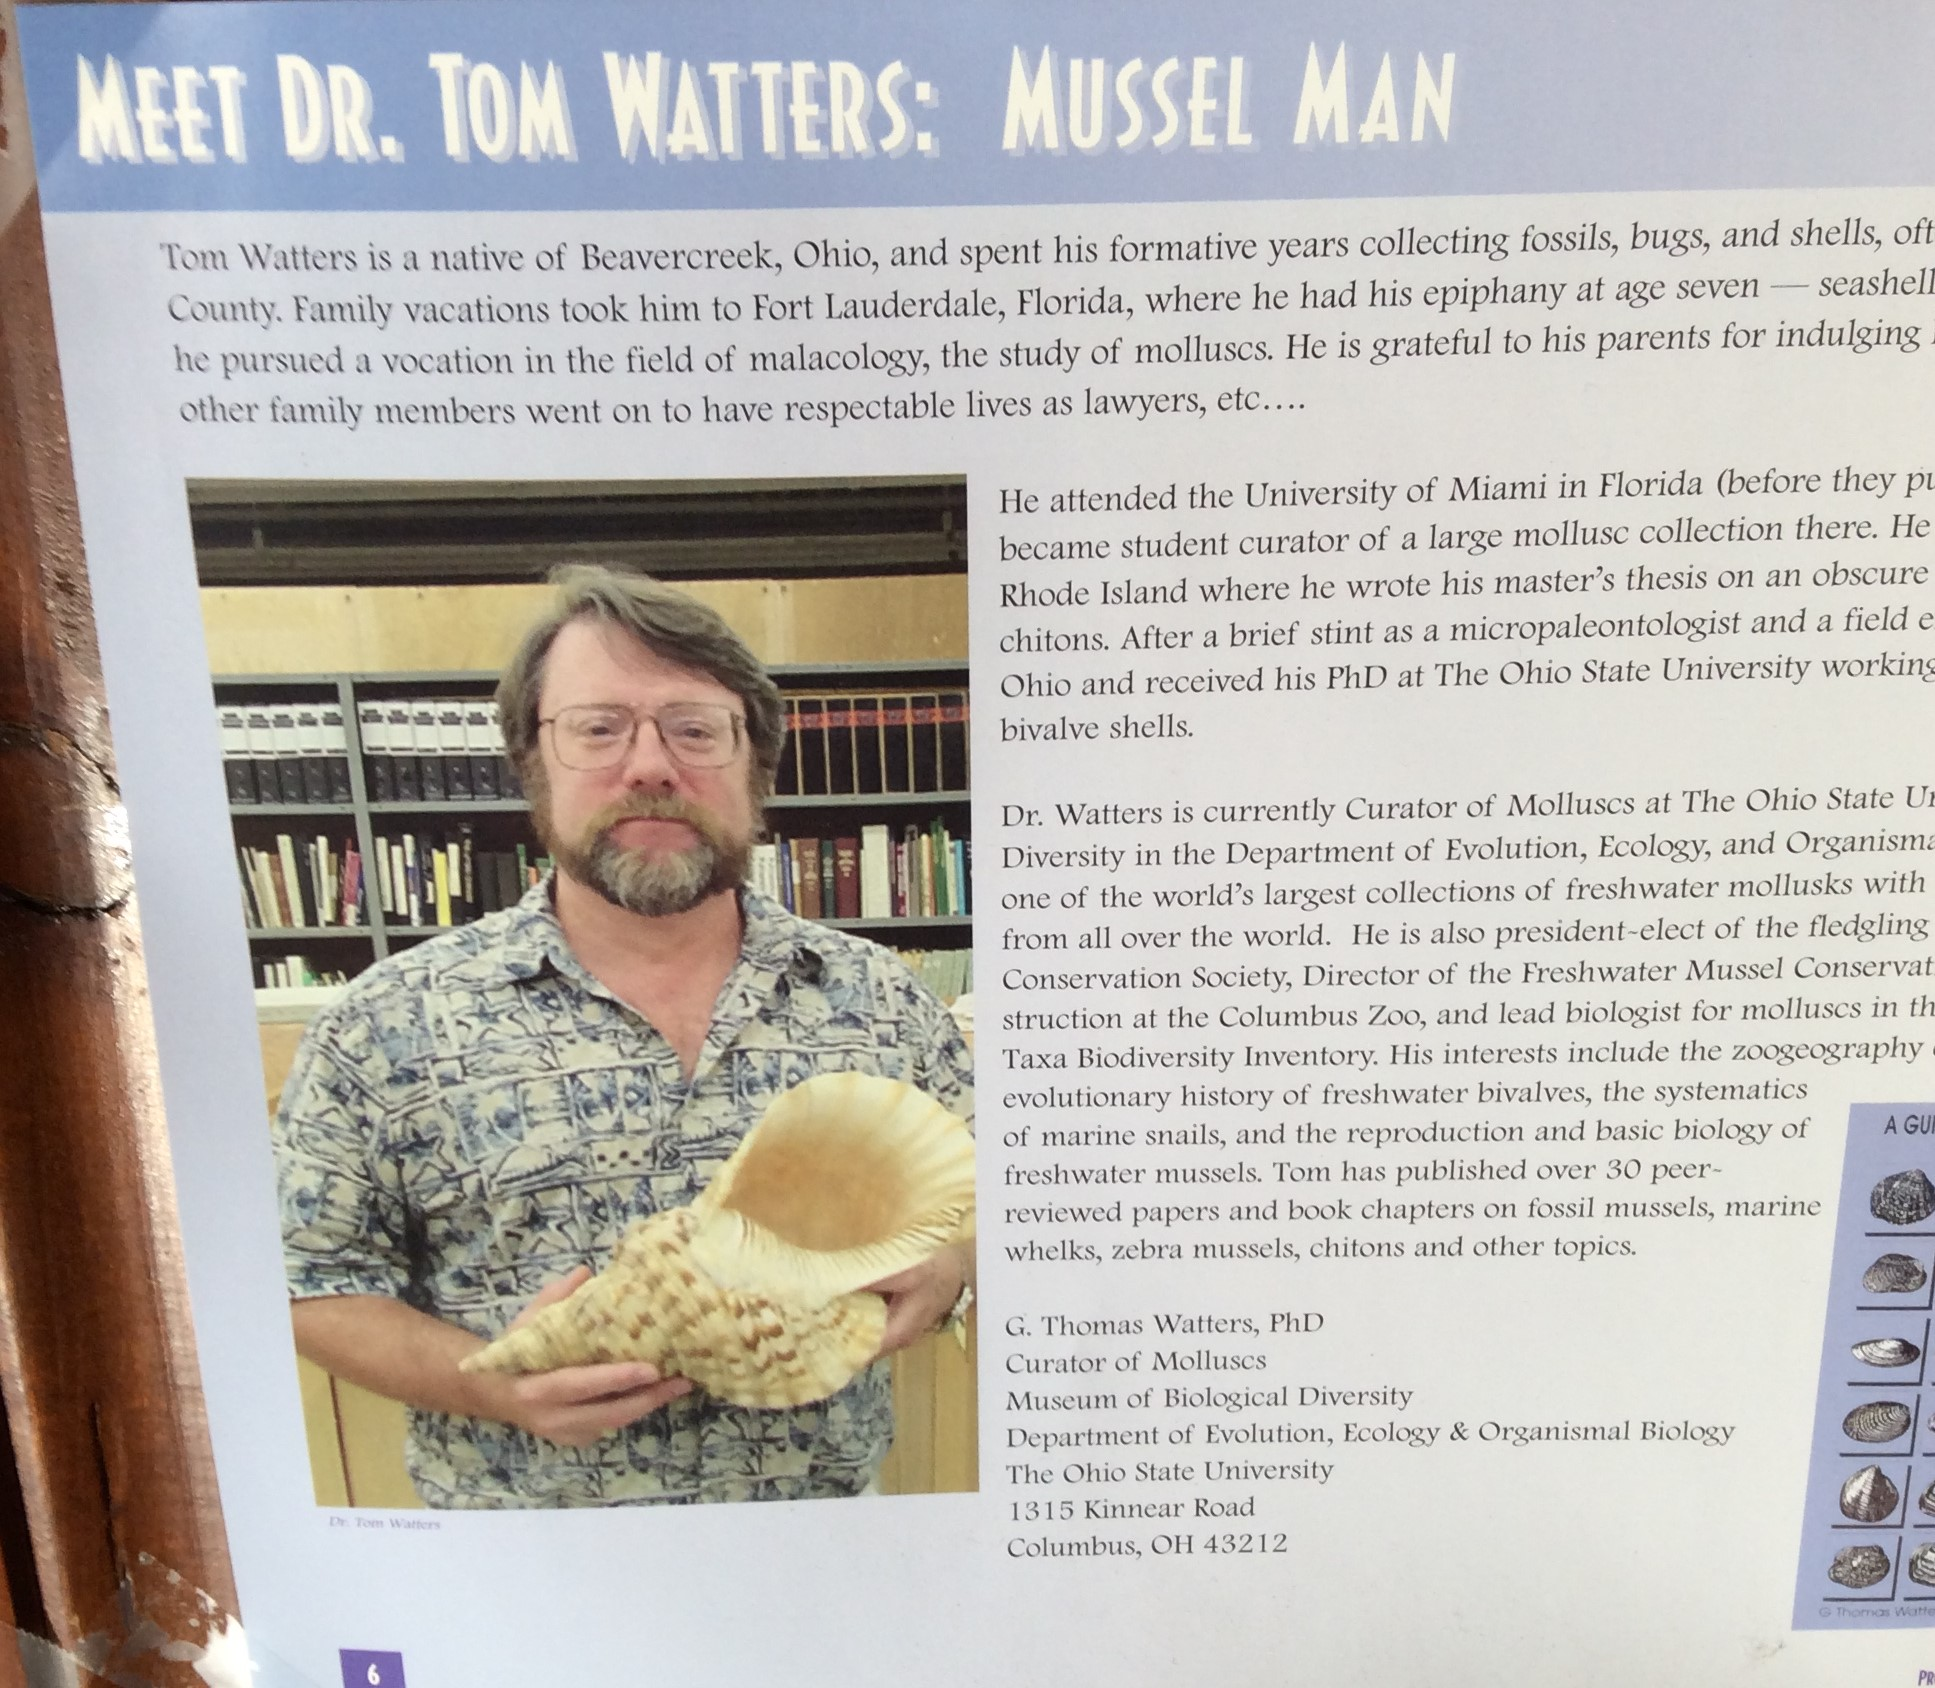 poster - Meet Dr. Tom Watters: mussel man